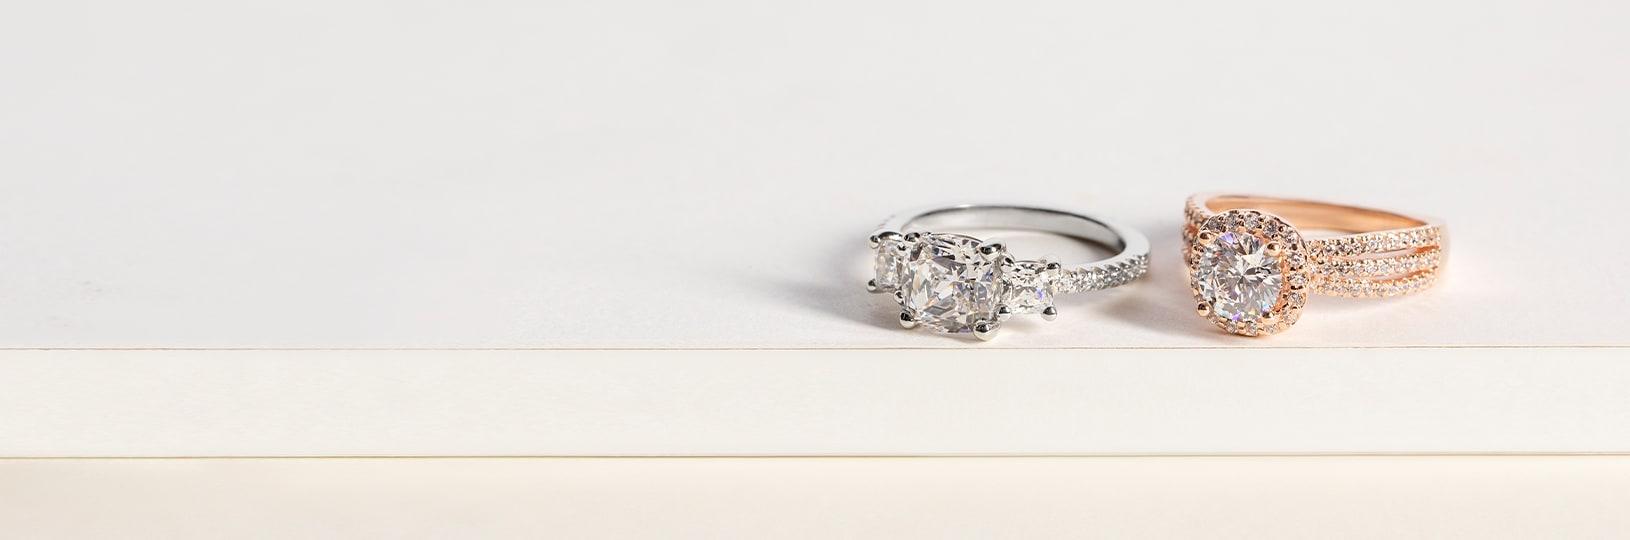 Simulated diamond engagement rings